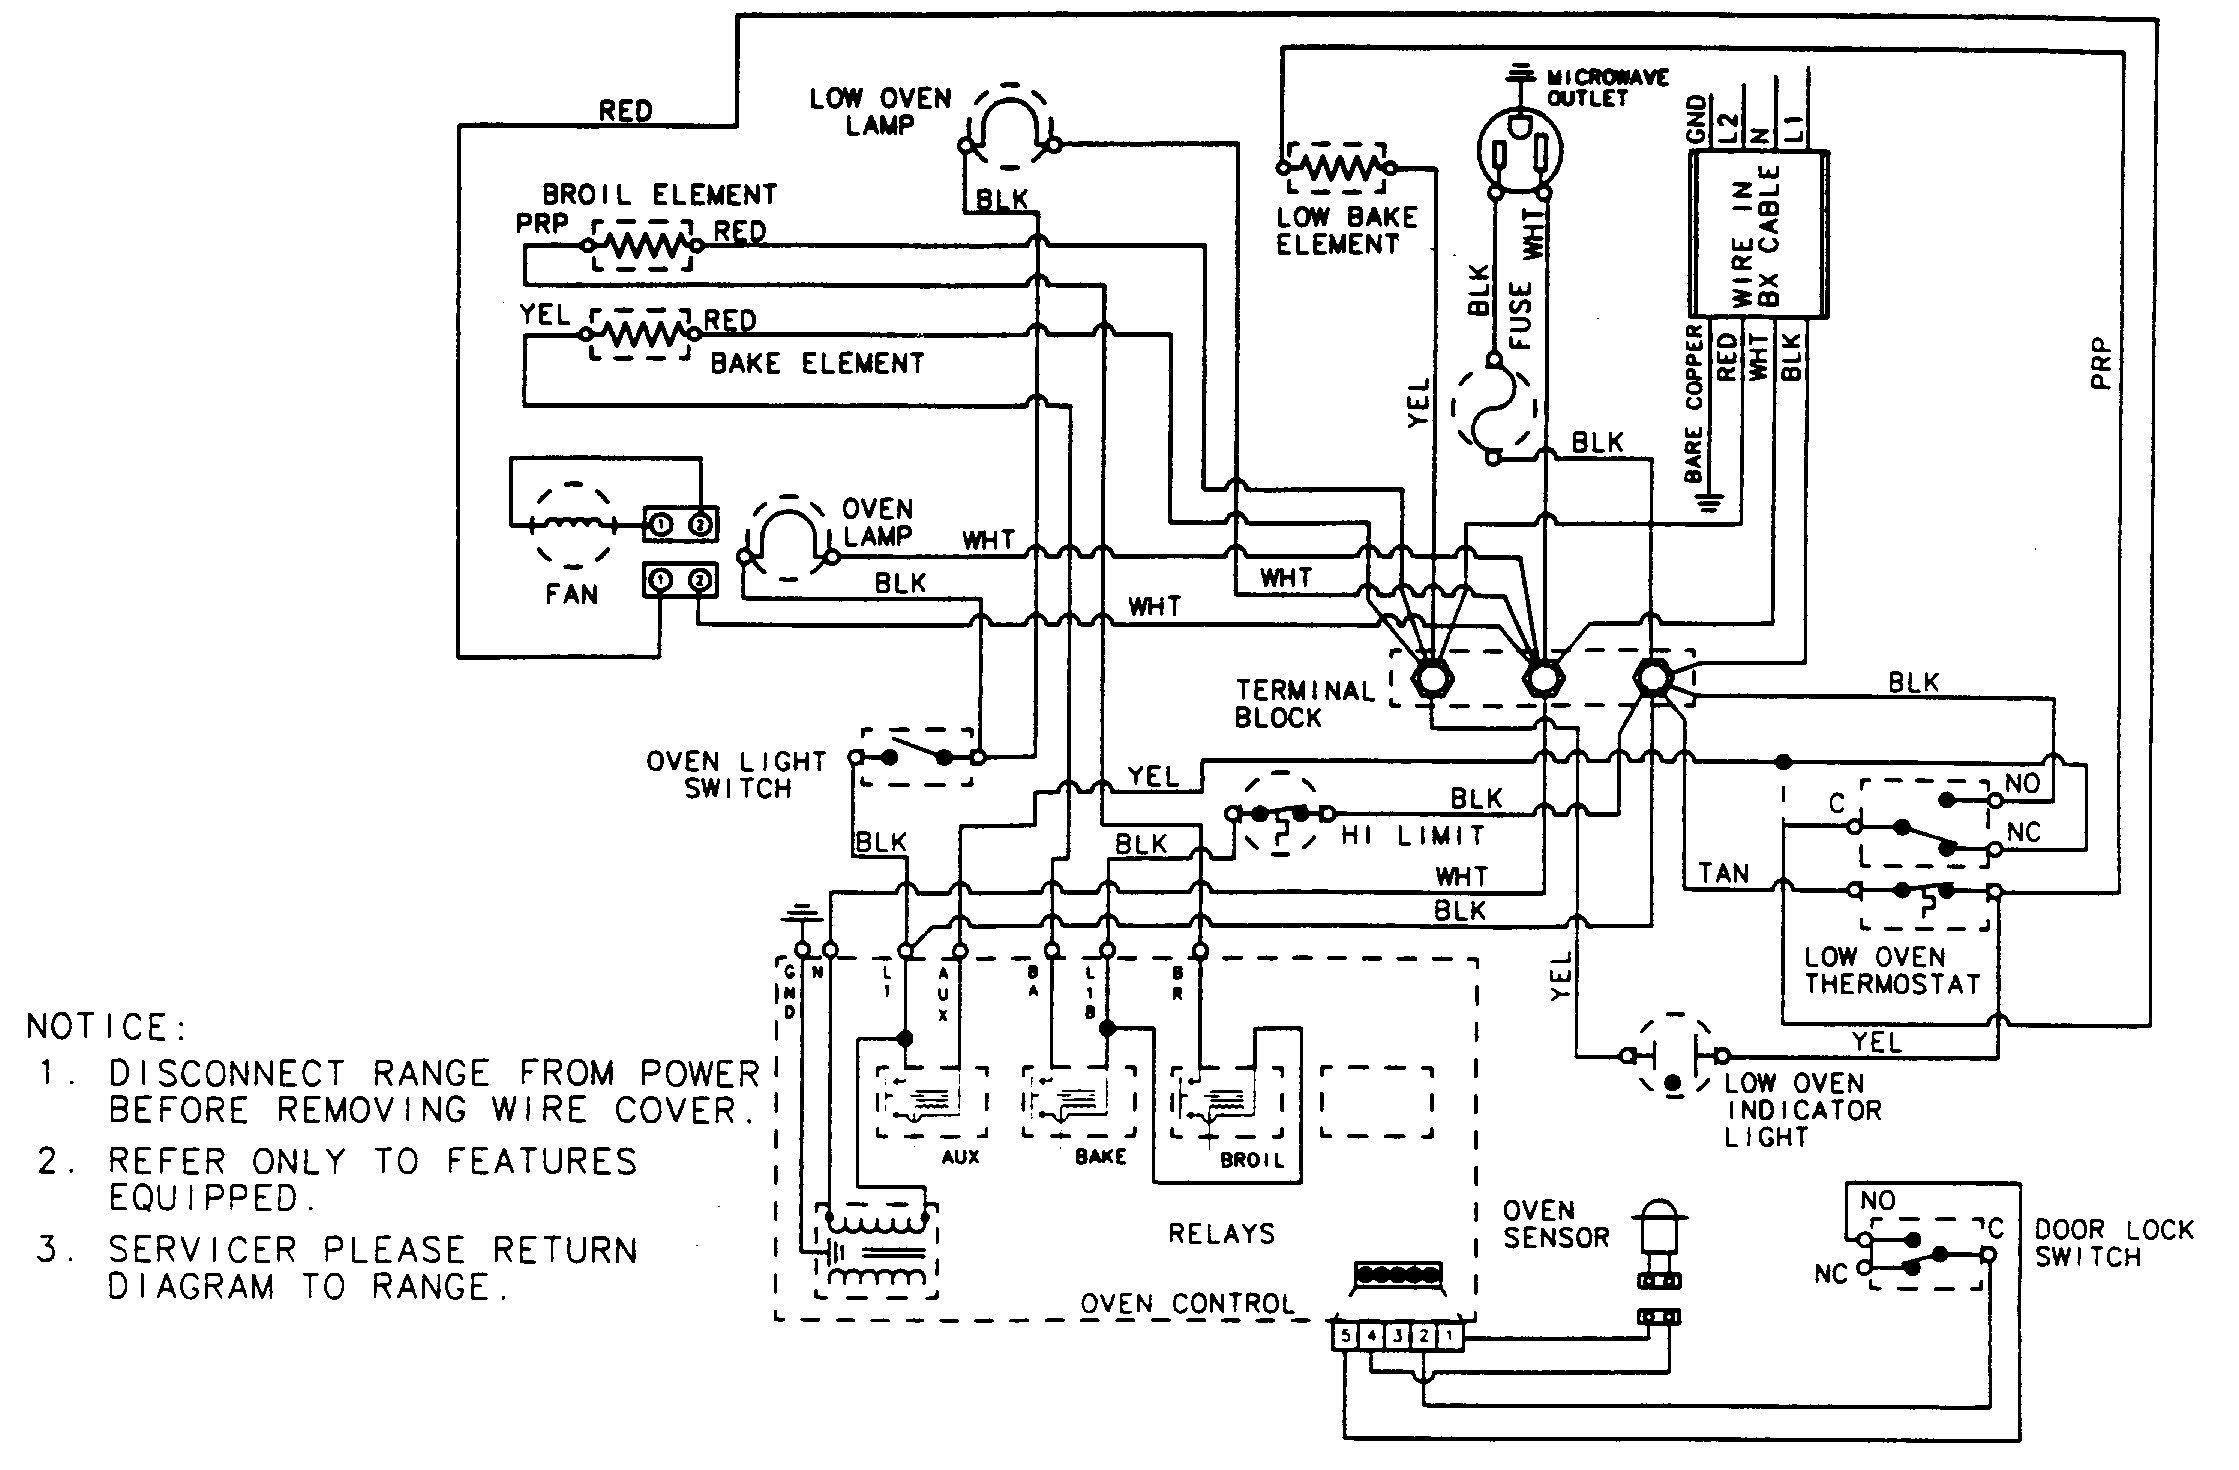 Ge Wiring Diagram Oven | Wiring Diagram on